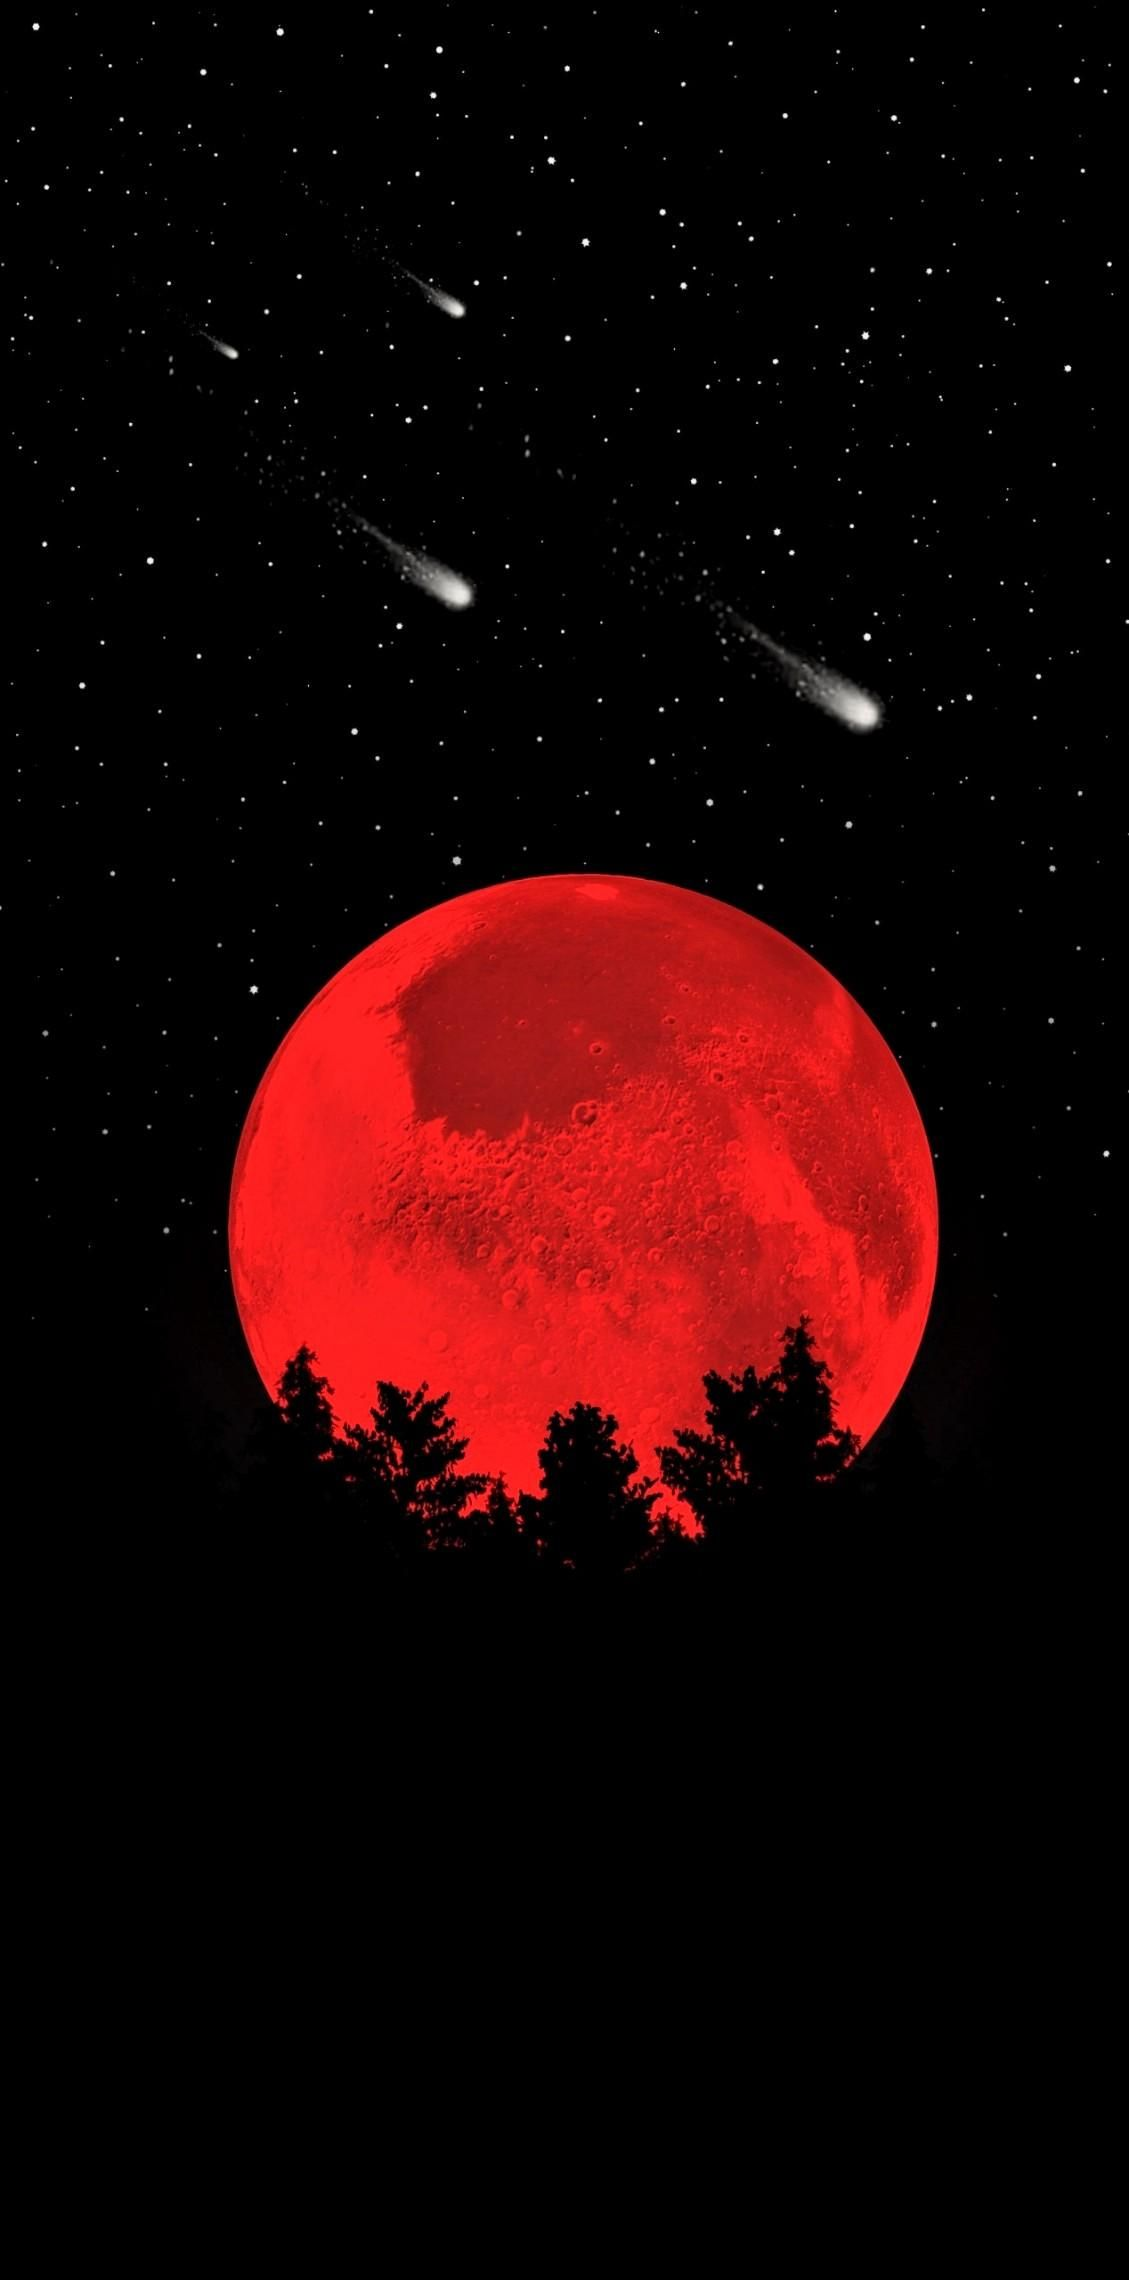 Red Sky Moon Light Celestial Event Darkness In 2020 Dark Wallpaper Cool Wallpaper Best Wallpaper For Mobile